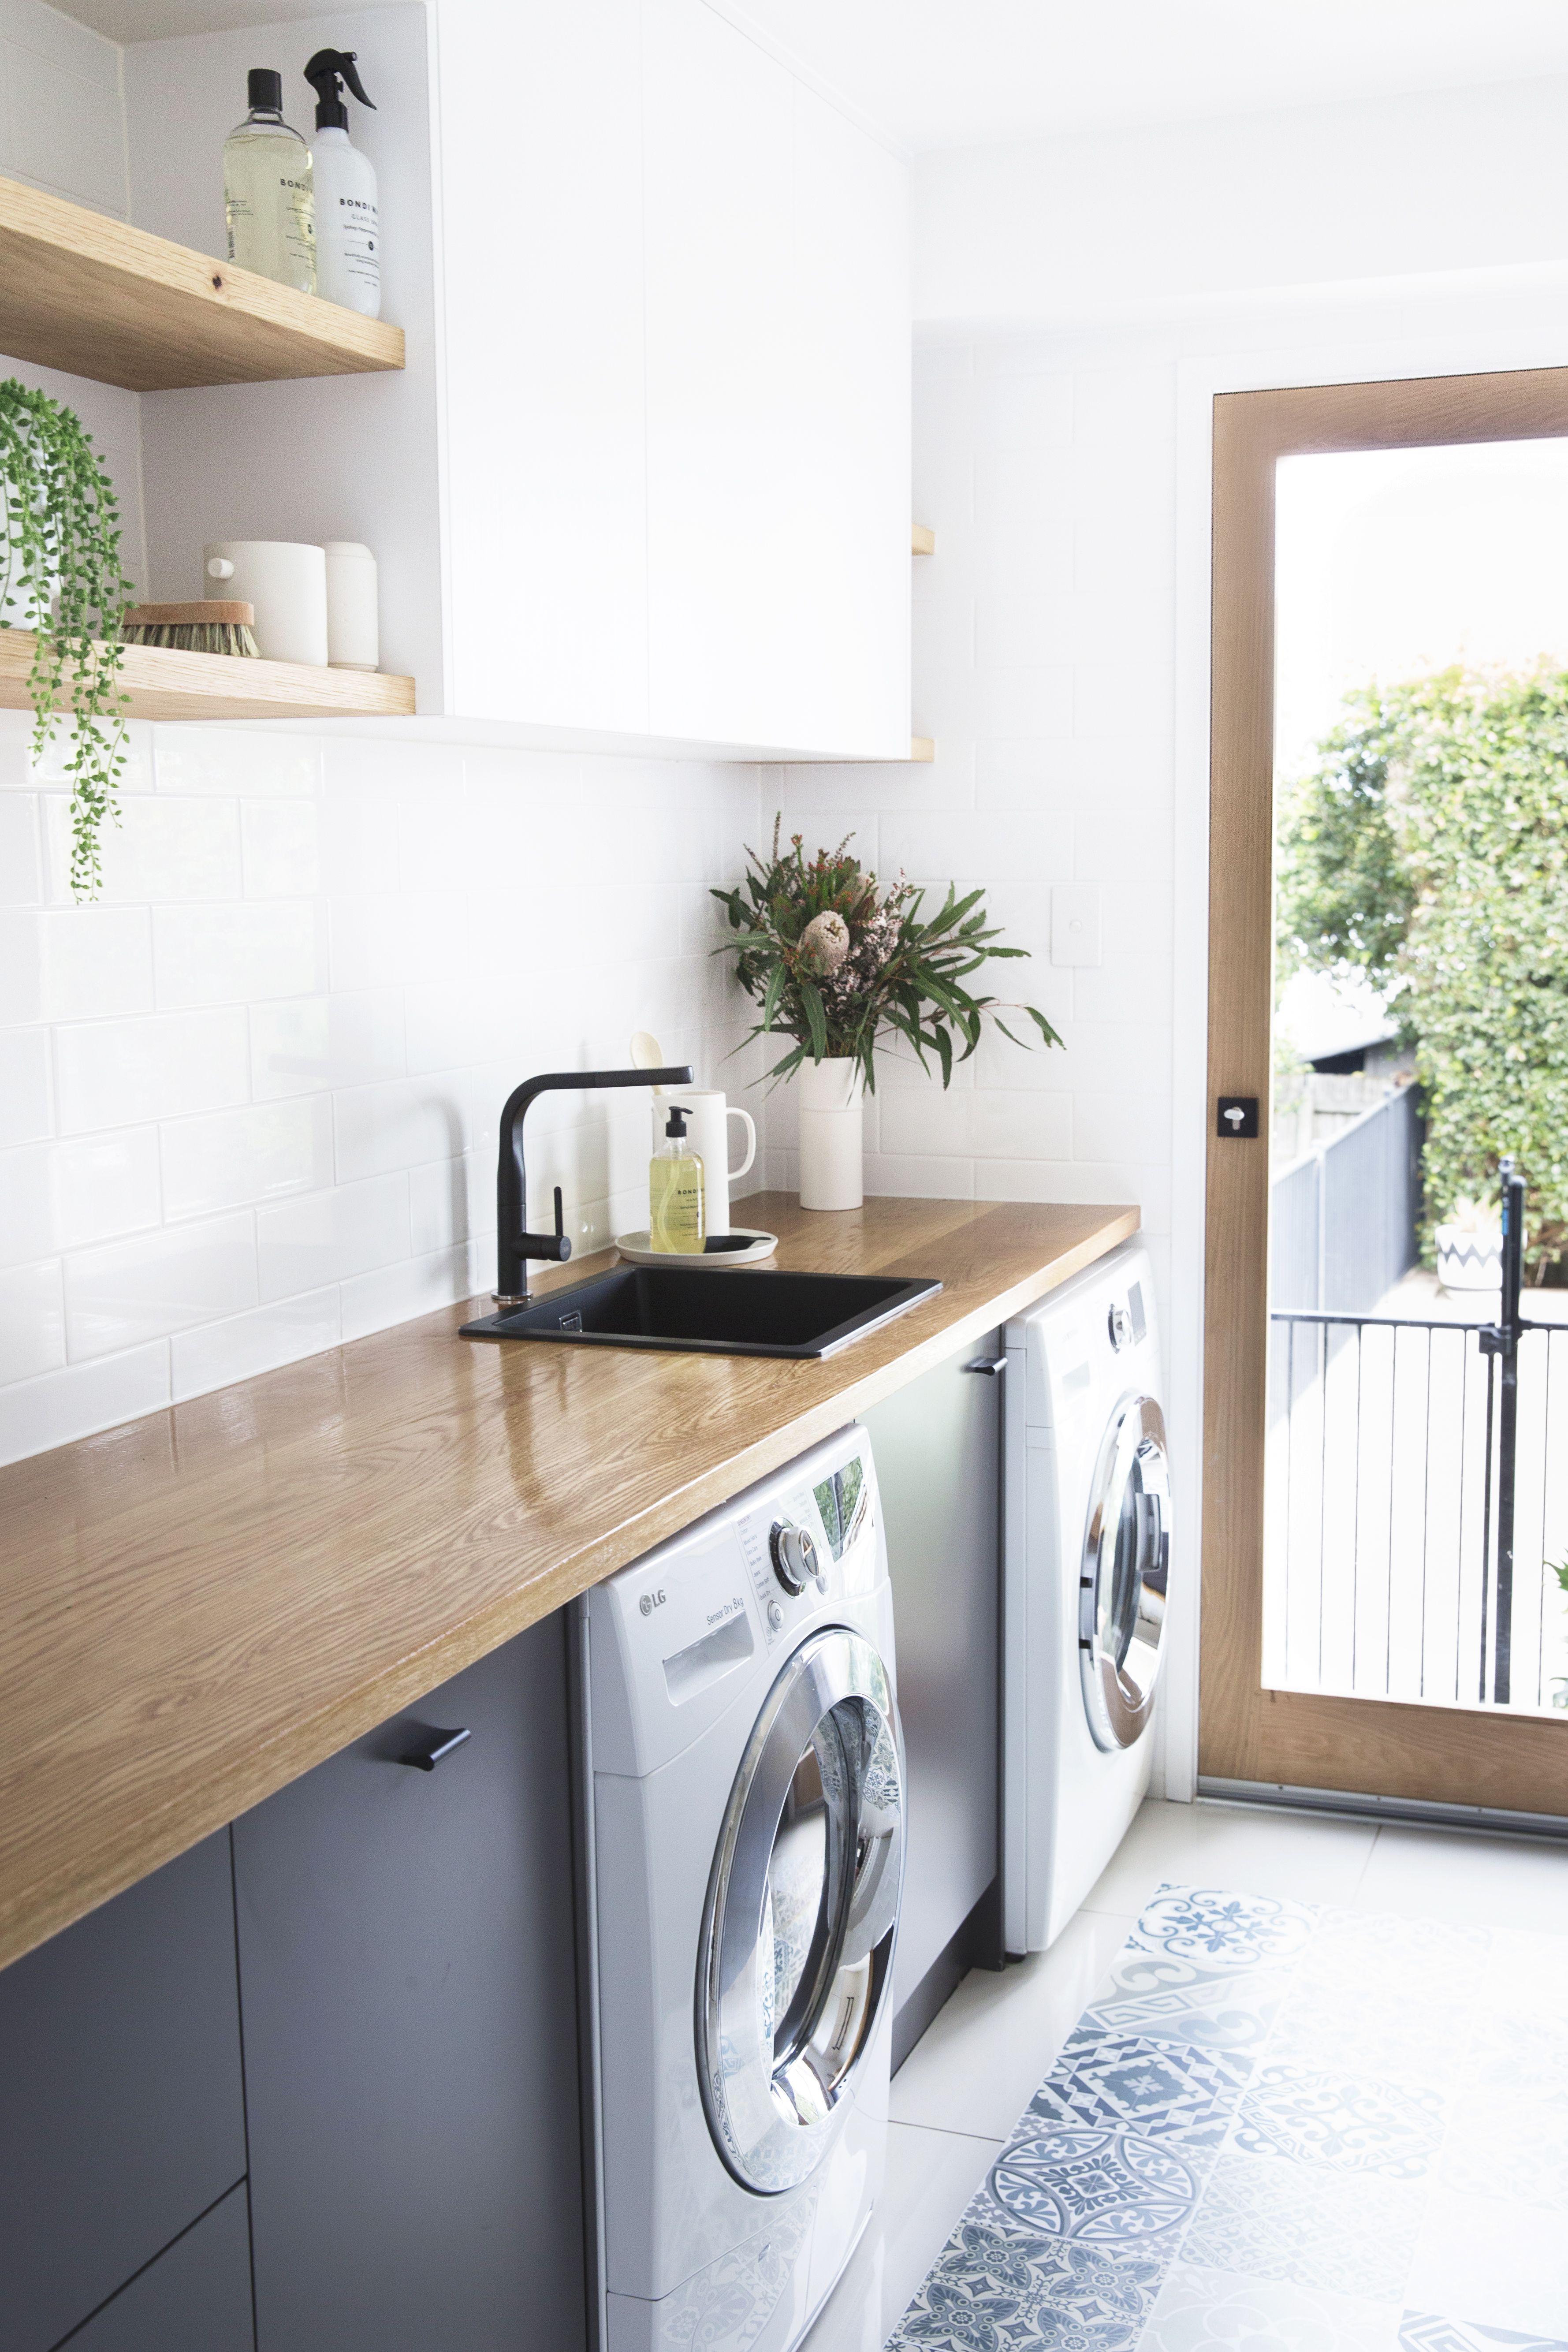 Organized Modern Laundry Room With Overhead Storage | HGTV